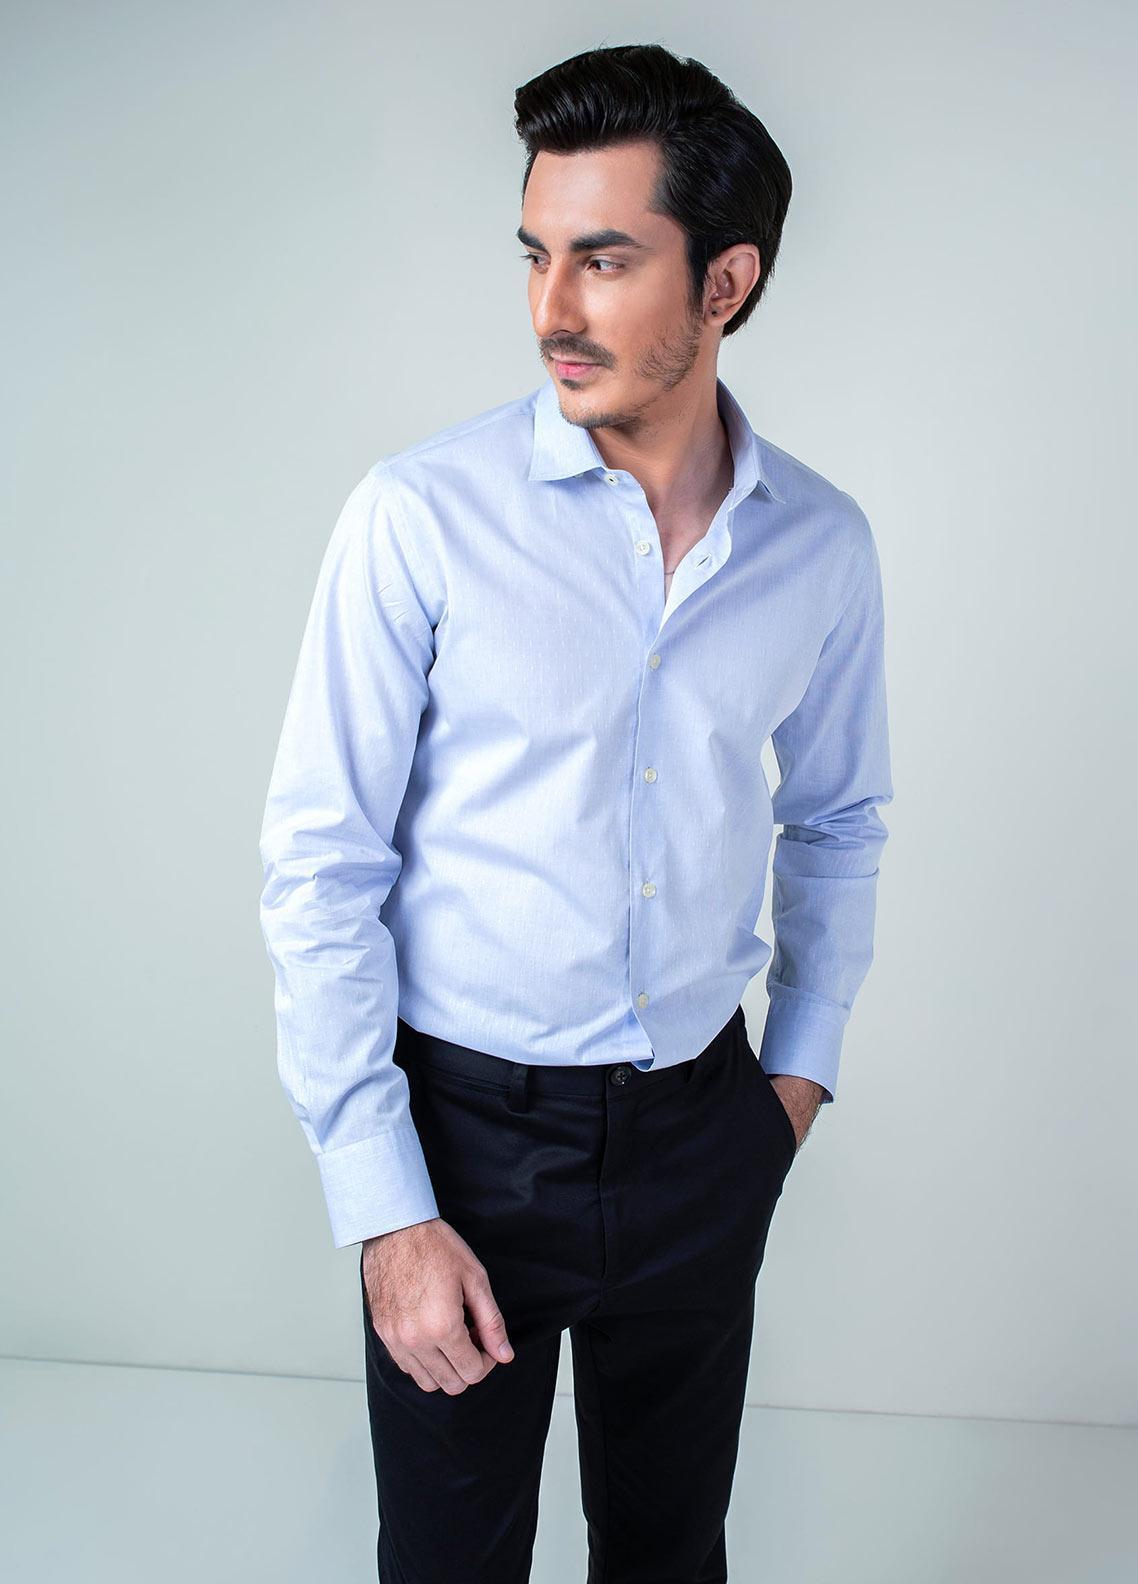 Brumano Cotton Formal Men Shirts -  BM20SH Light Blue Dobby Shirt